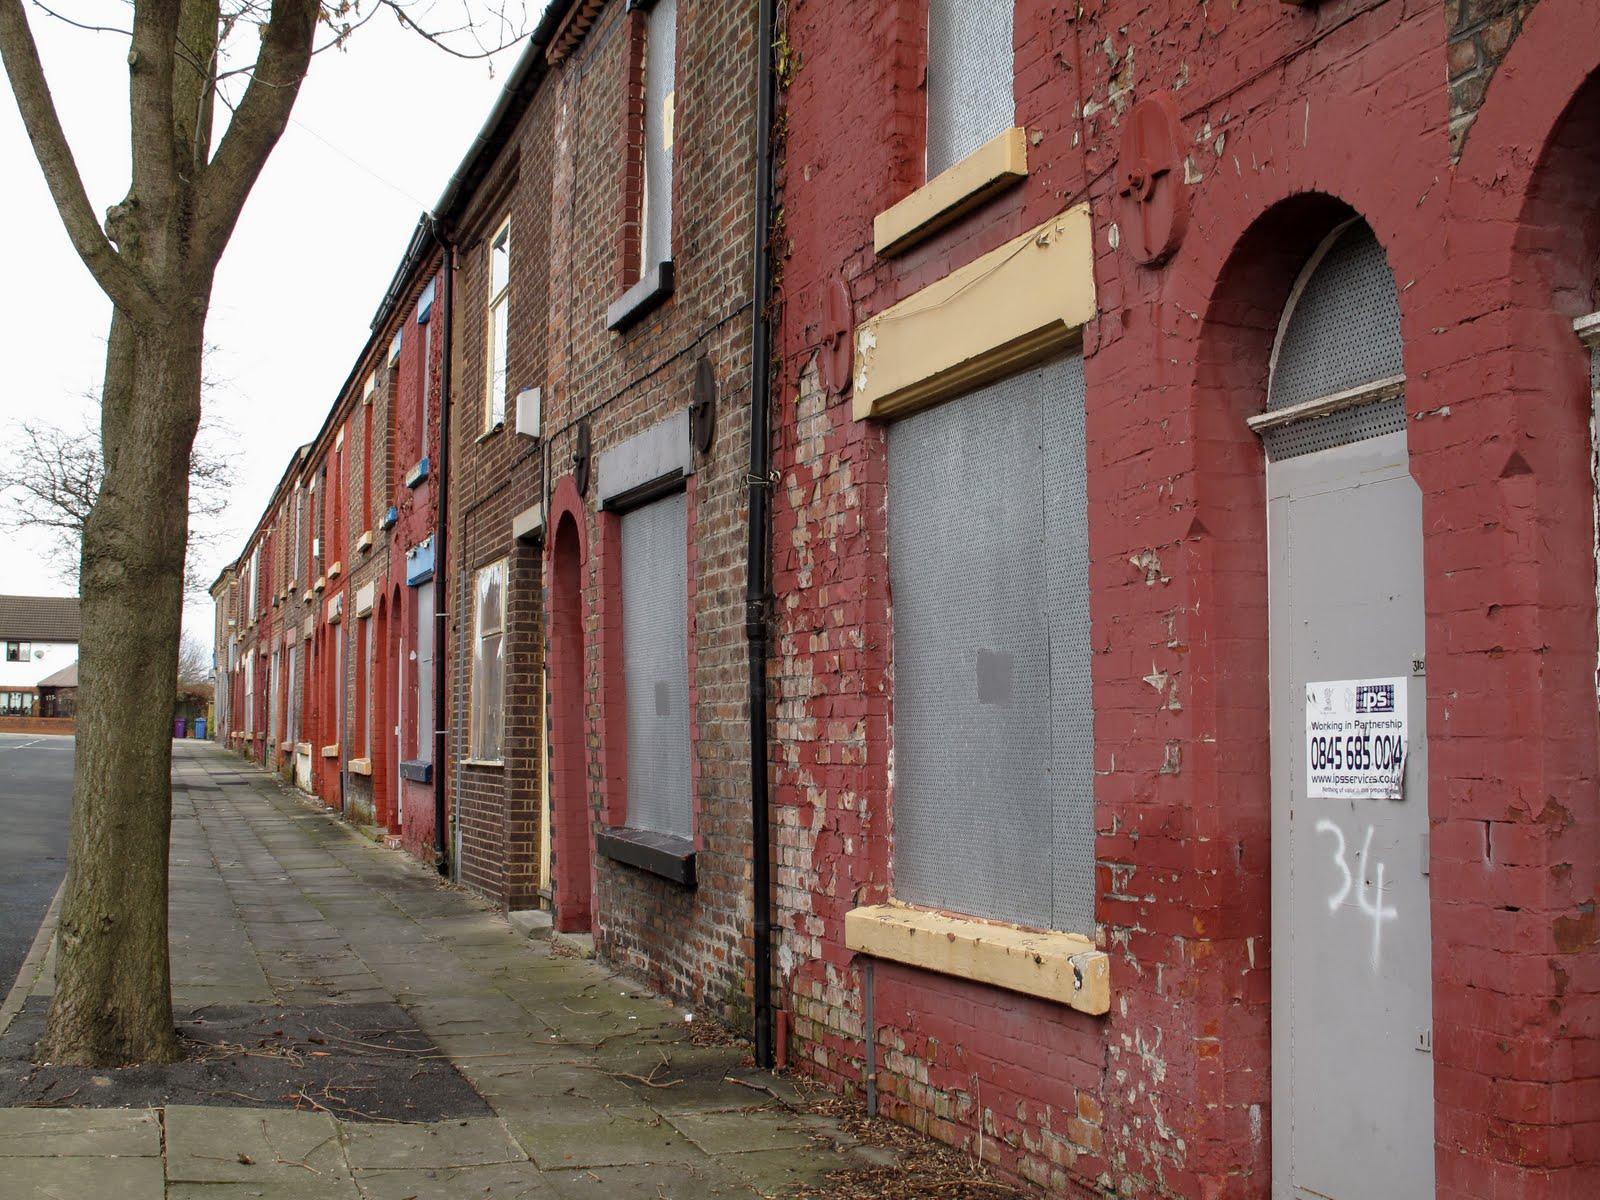 21 madryn street  the house that refused to die  june 2011